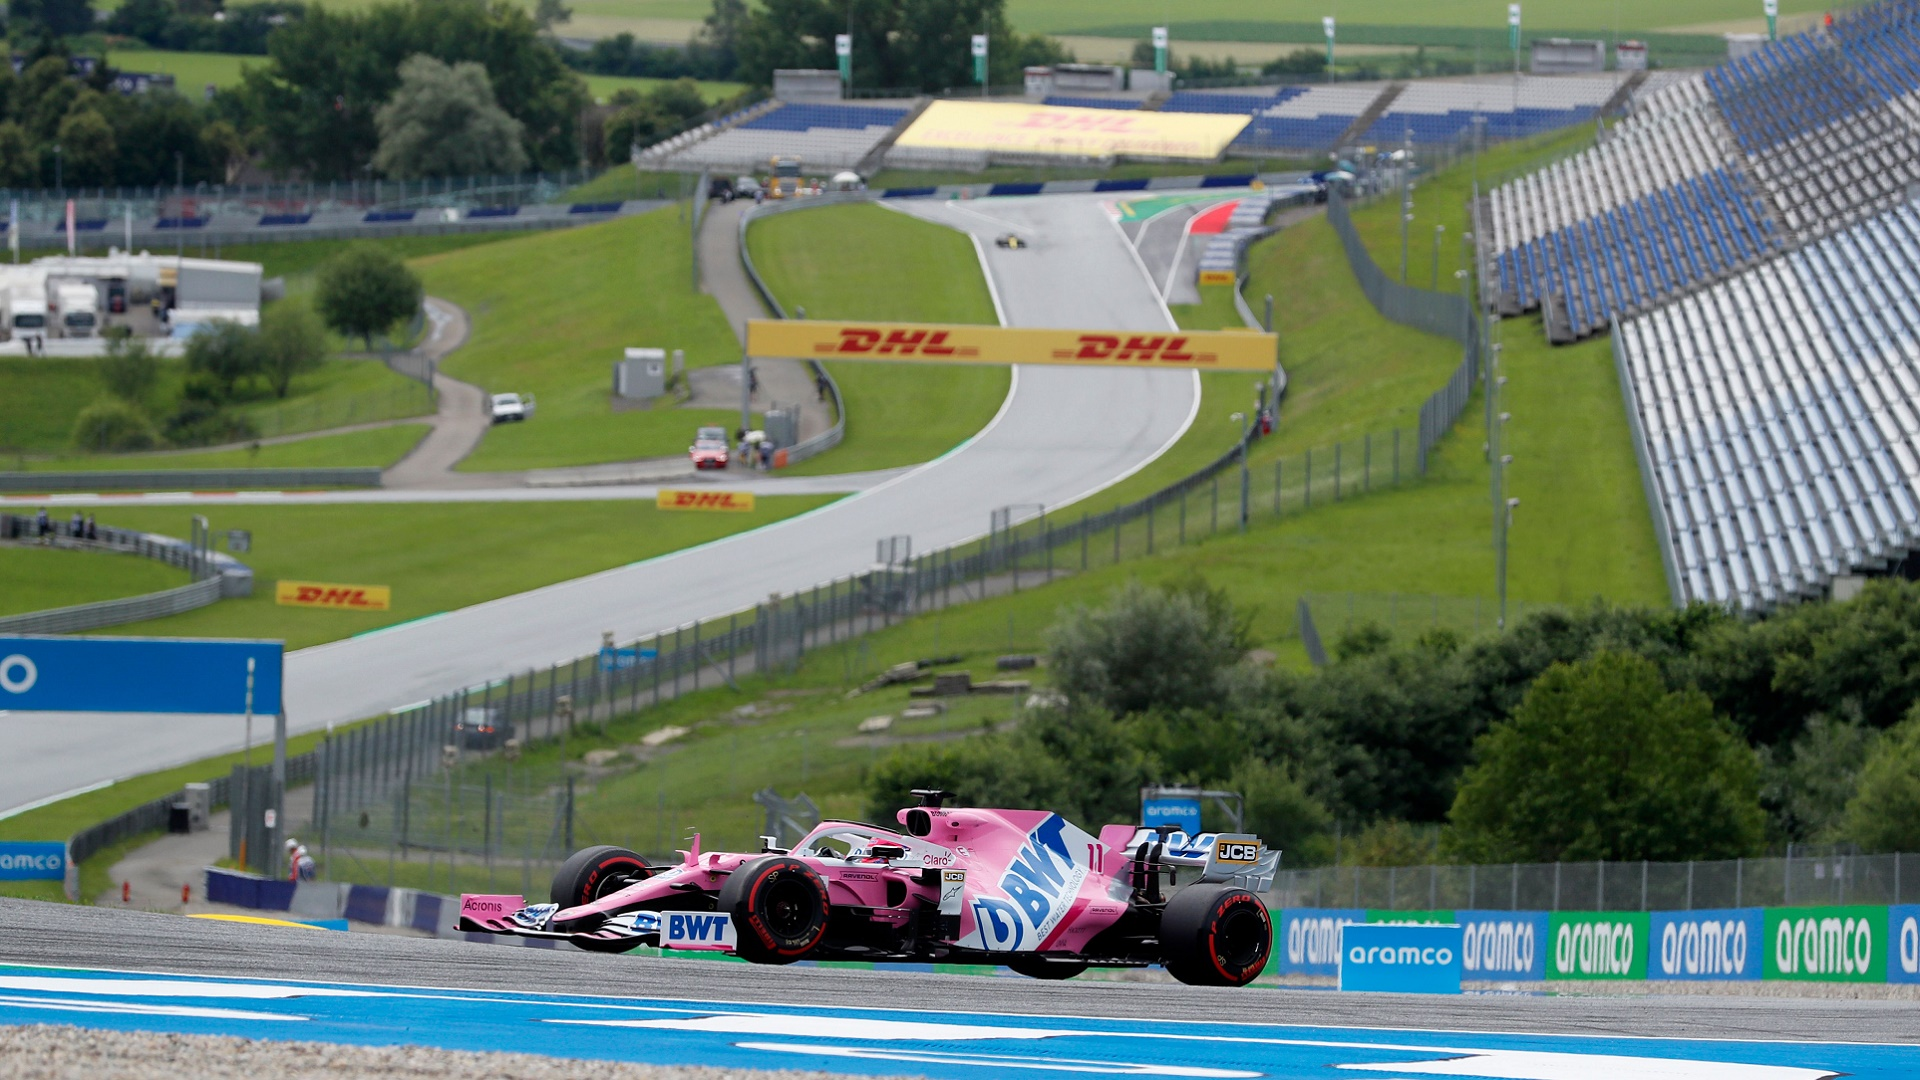 2020-07-03 Austria F1 Formula 1 Perez Racing Point